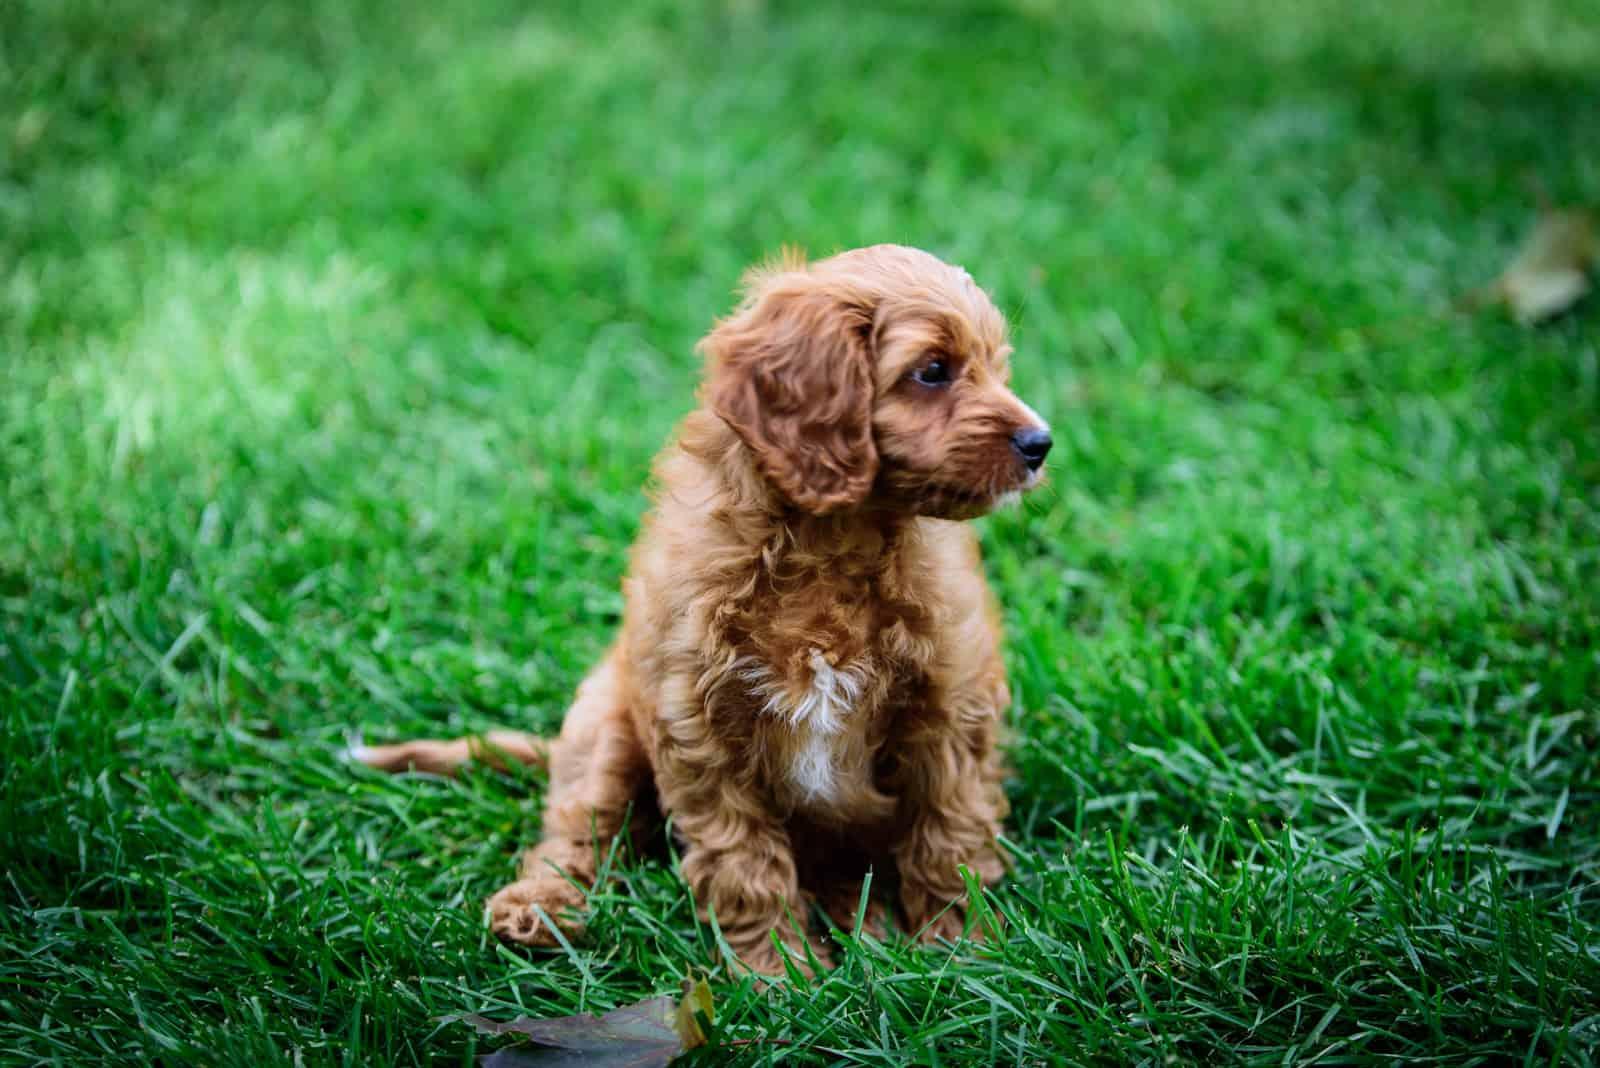 Cavapoo puppy in the backyard